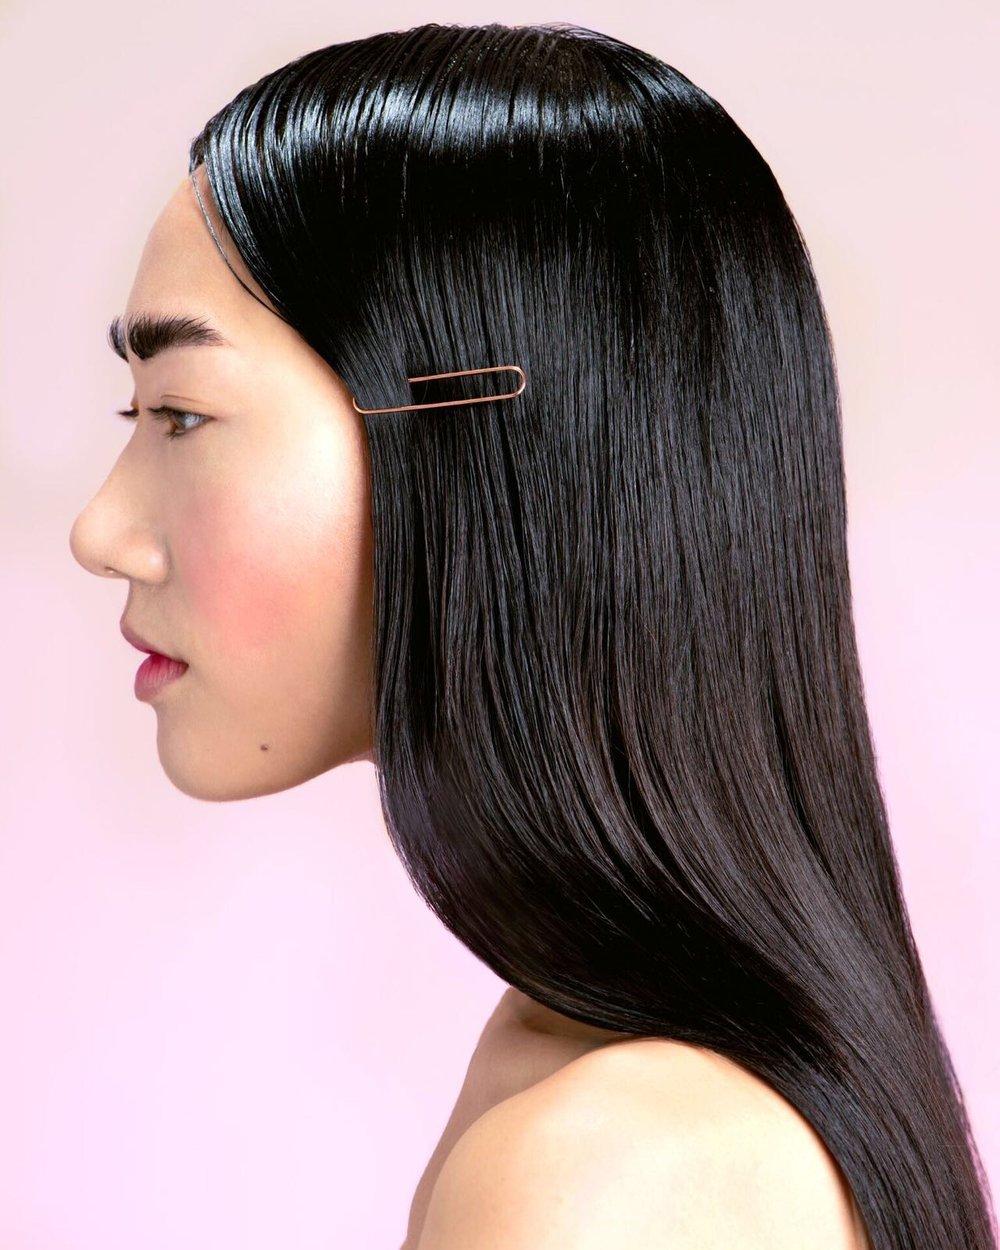 Photographer:  David Sheldrick  Hair:  Shelley Sumner  Makeup:  Louise Lerego  Model:  Jessica Yang